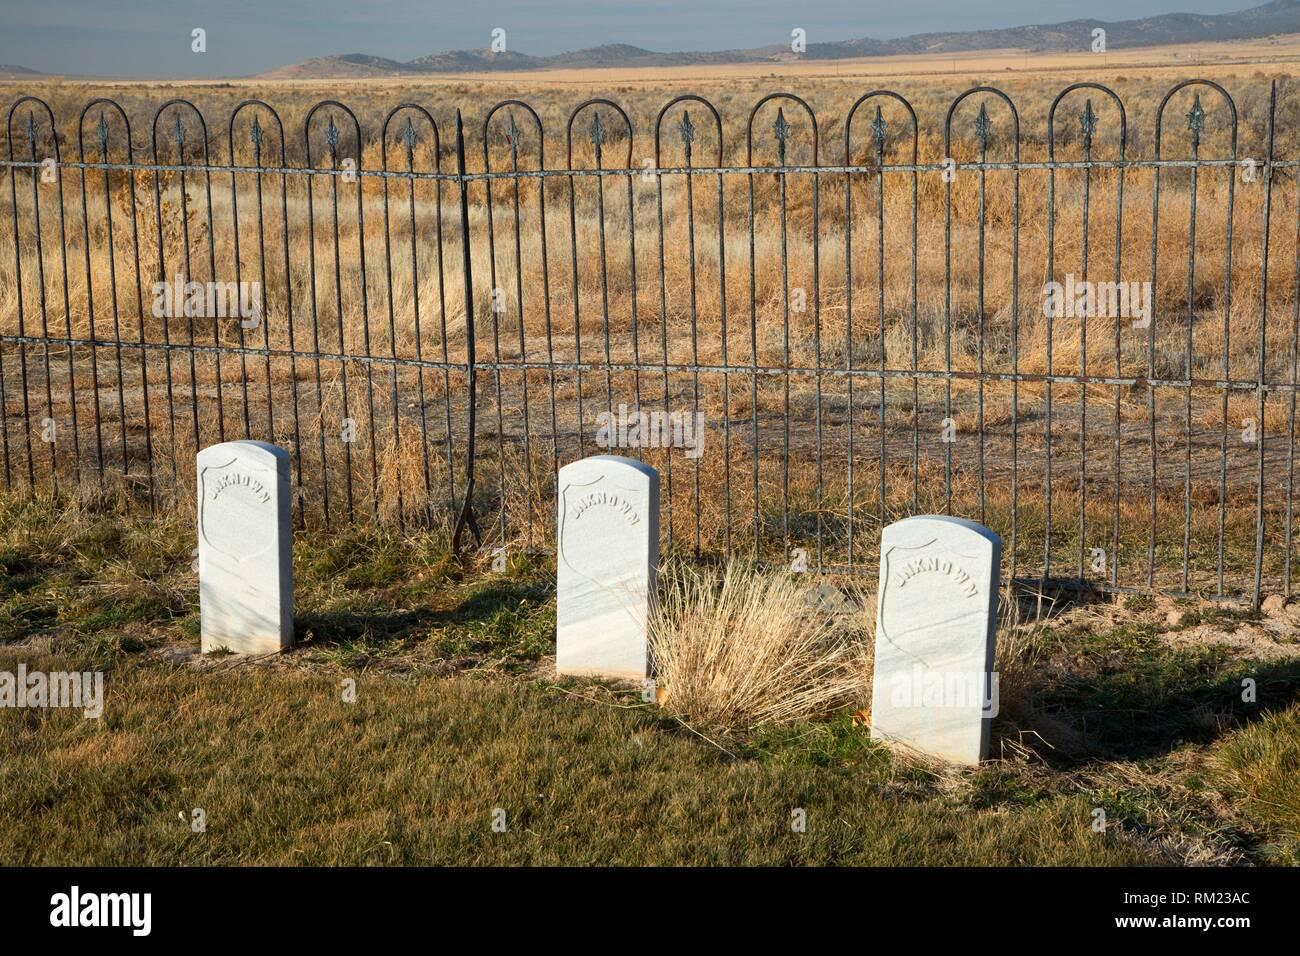 Camp, Campamento Cementerio Floyd Floyd State Park Museum, Utah. Imagen De Stock